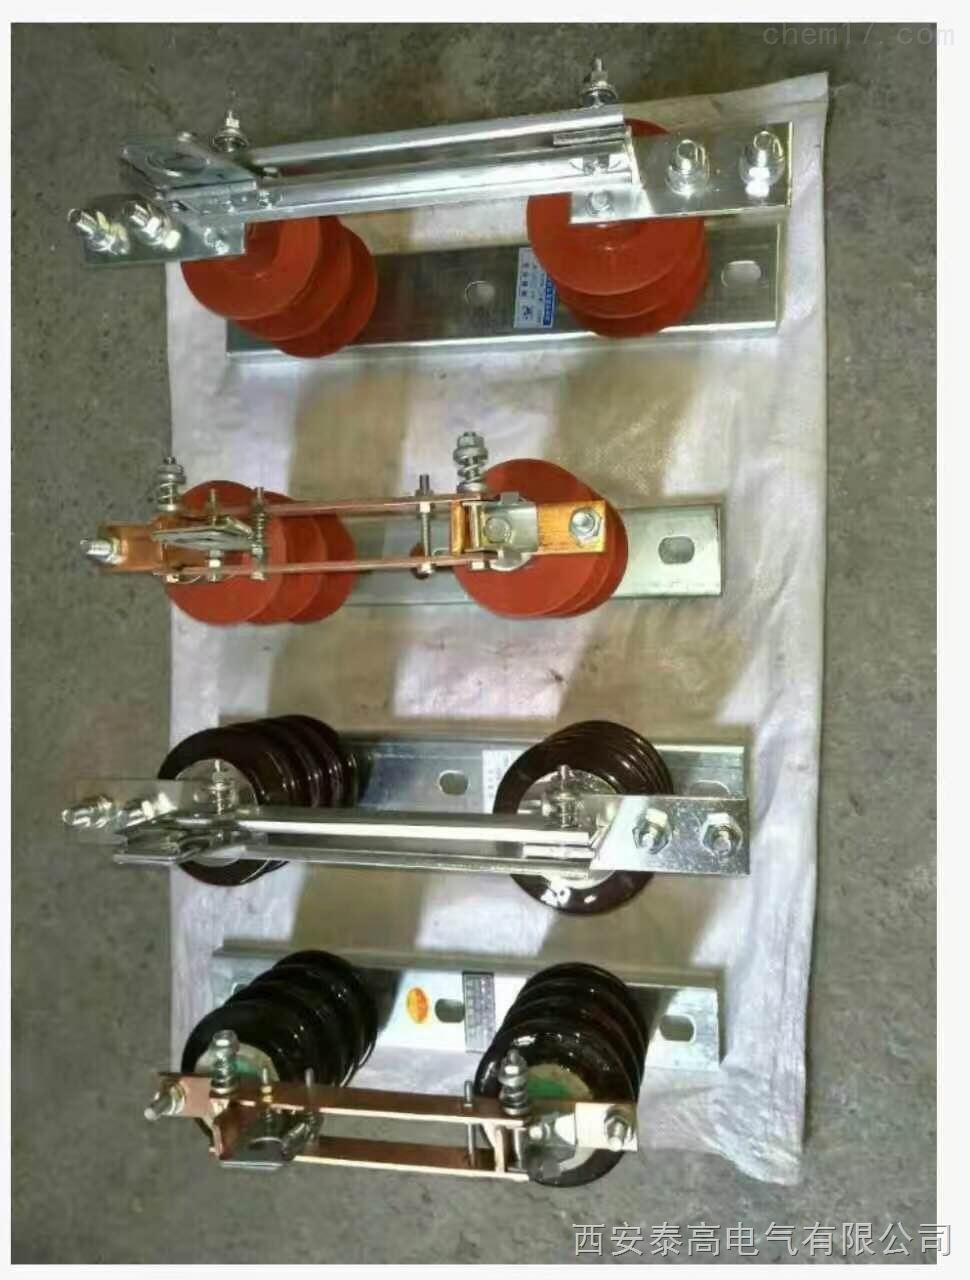 10kv柱上高压隔离开关GW9-12高压隔离刀闸